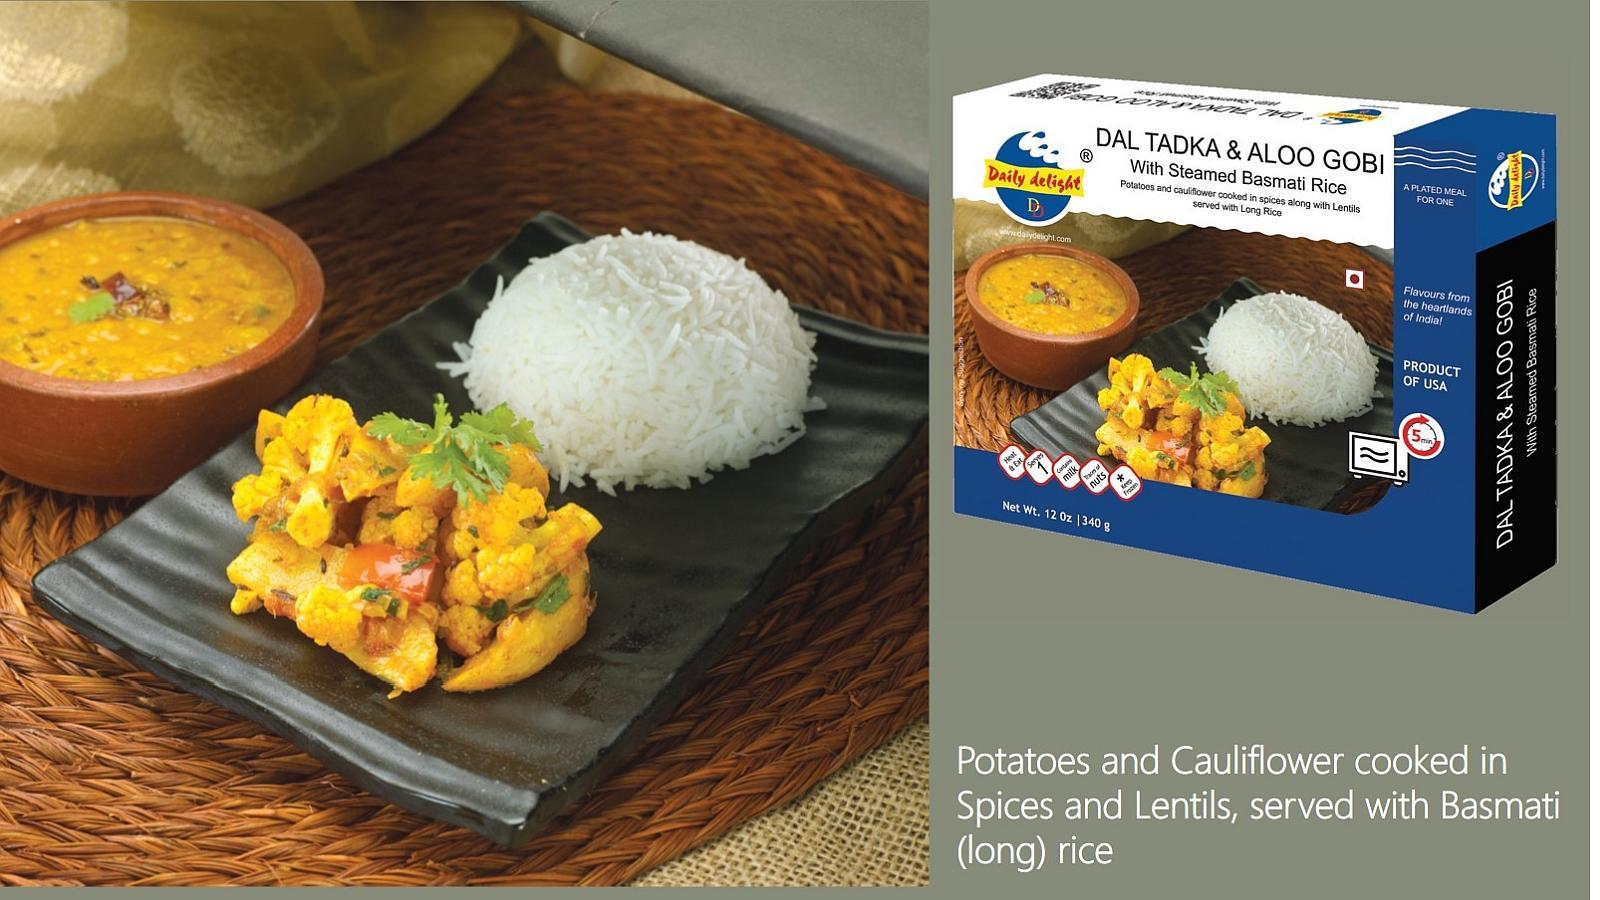 Basmati Rice - Dal Tadka - Aloo Gobi